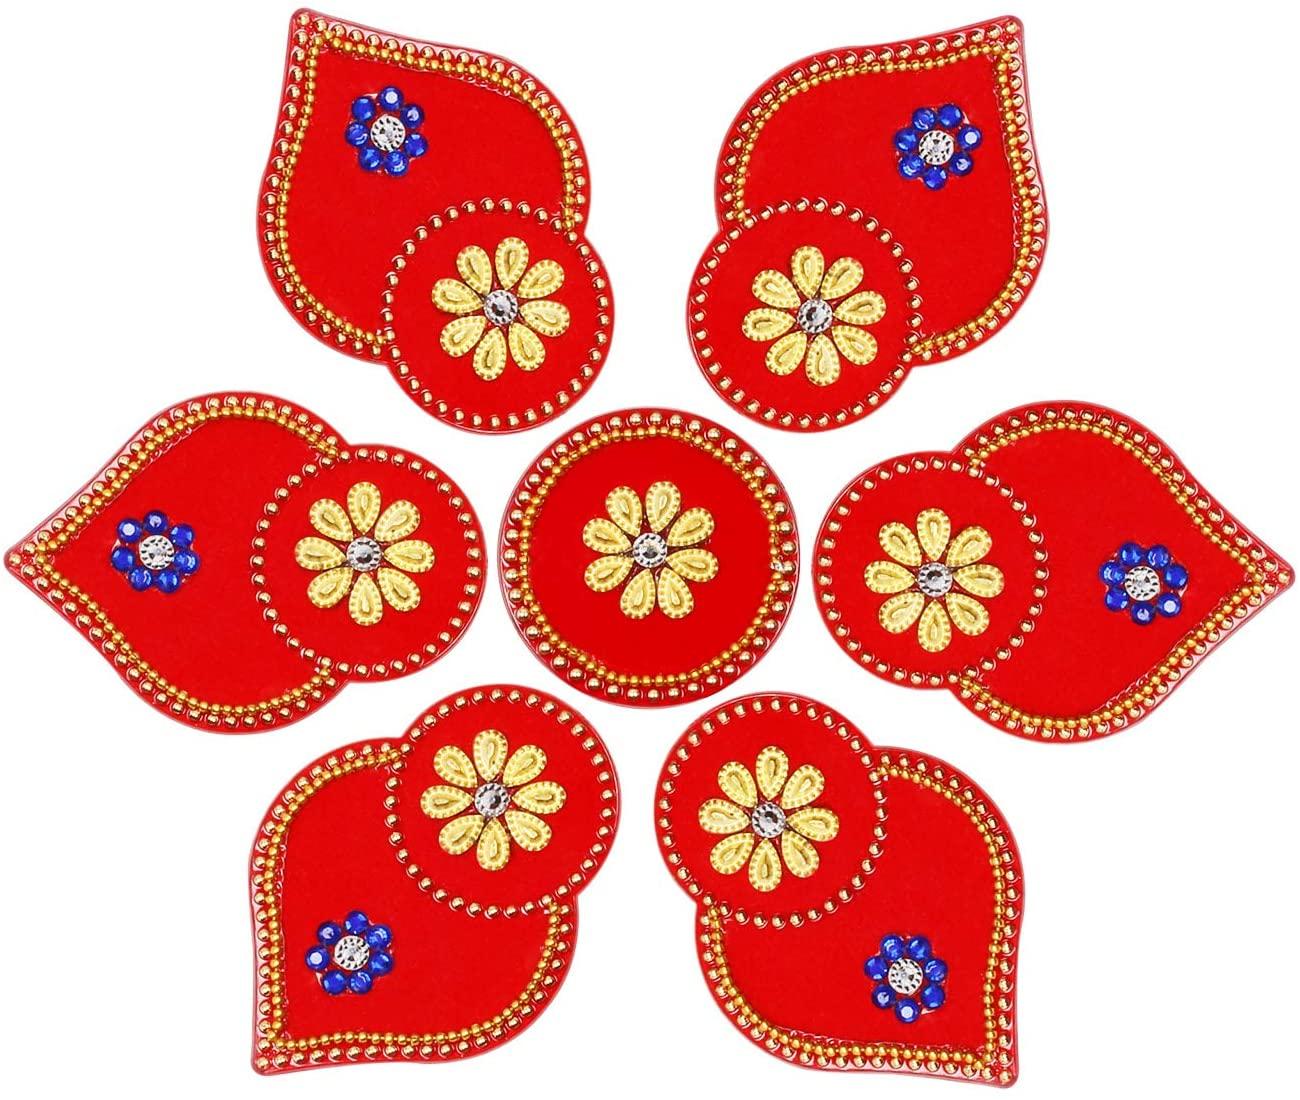 NAVRANG Diwali Acrylic Handmade Rangoli Home Decor Floor Stickers Natural Leaf Design Red Color 7 Pieces Diamond, Kundan & Decorative Stones Studed